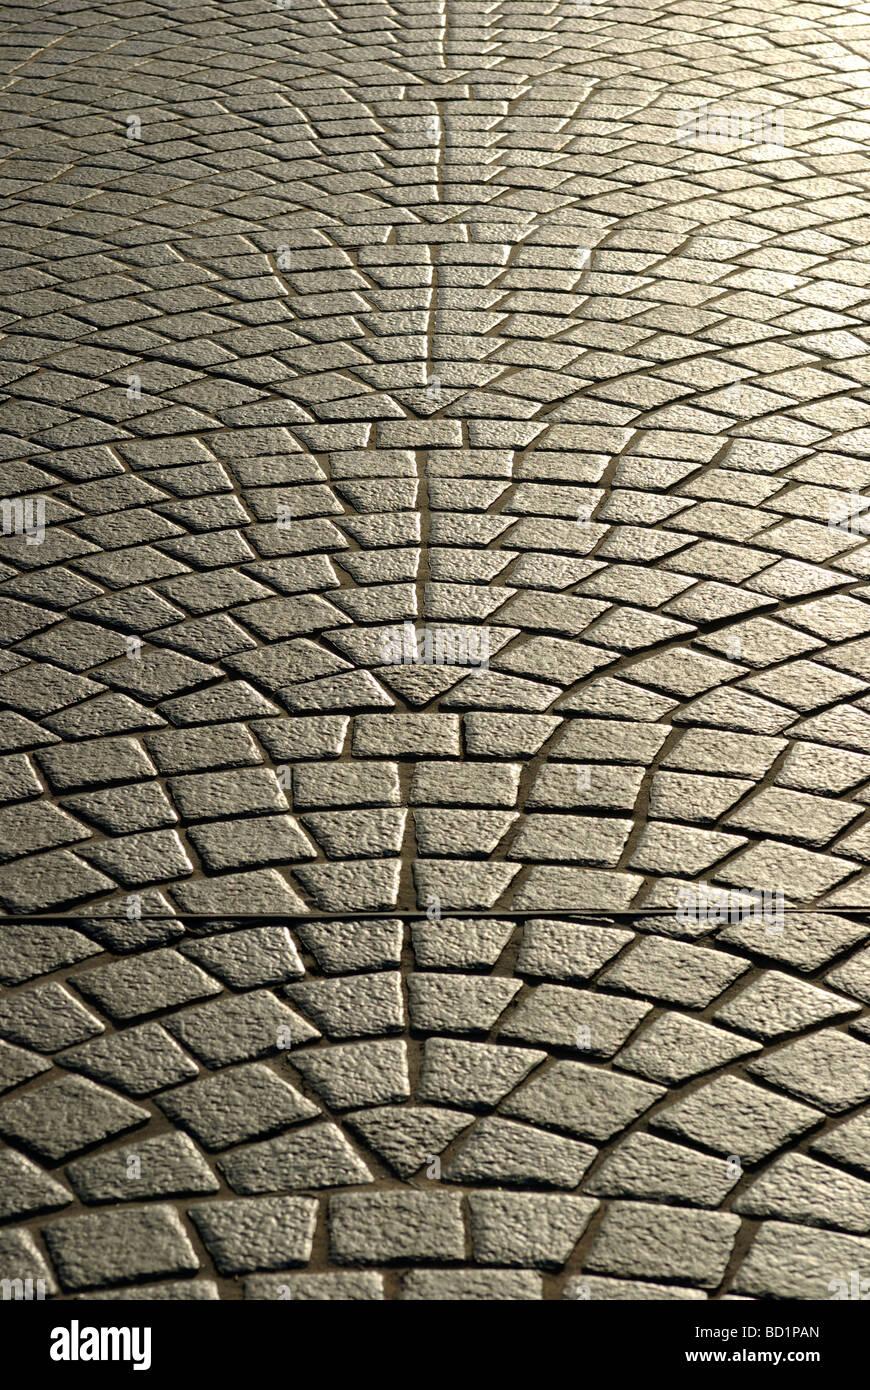 Cobble stone path - Stock Image